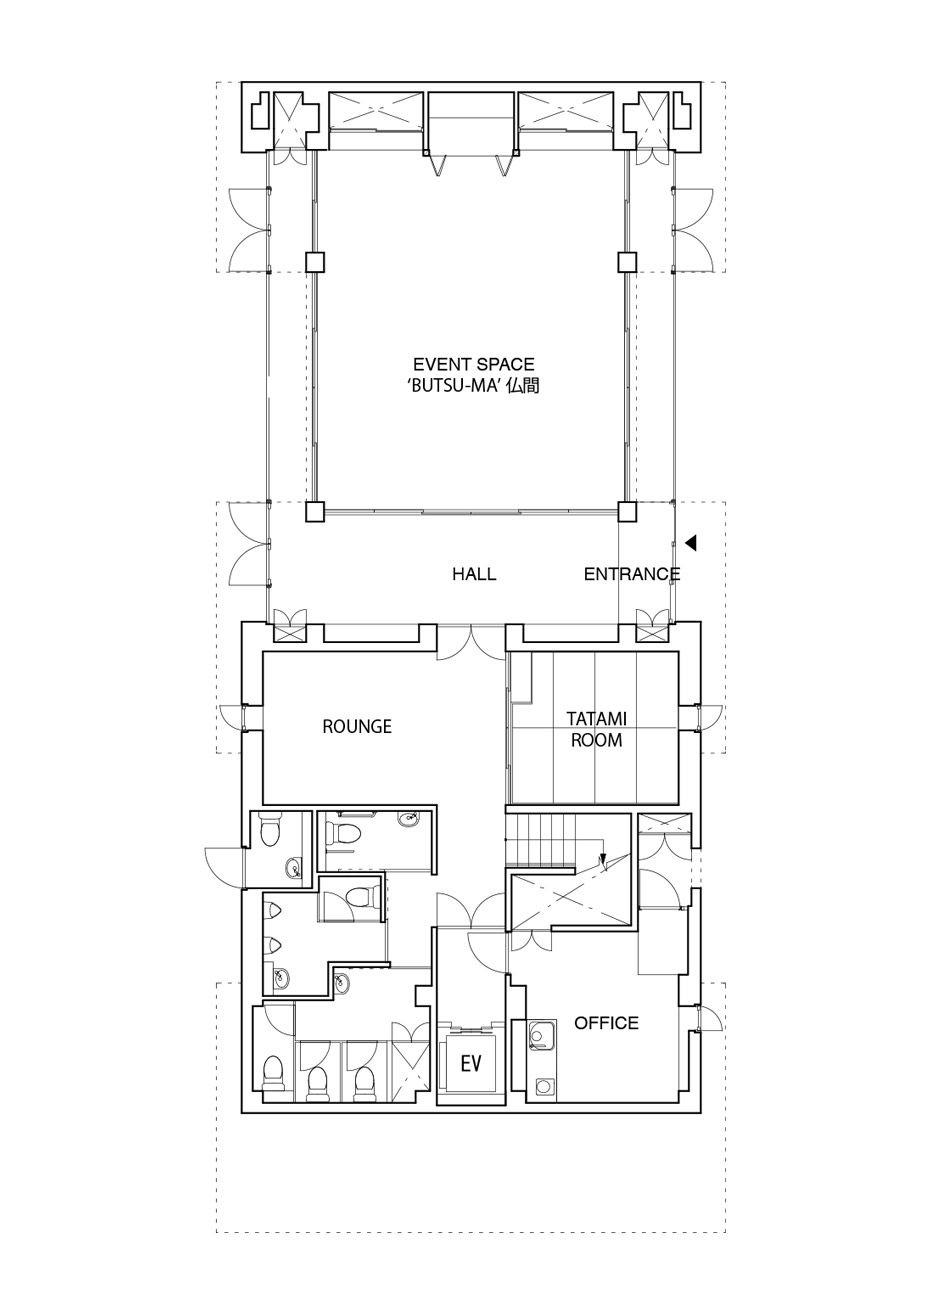 Toru Kashihara Architects Design Stepped Concrete Temple In Tokyo Architect Design Architect Architecture Plan